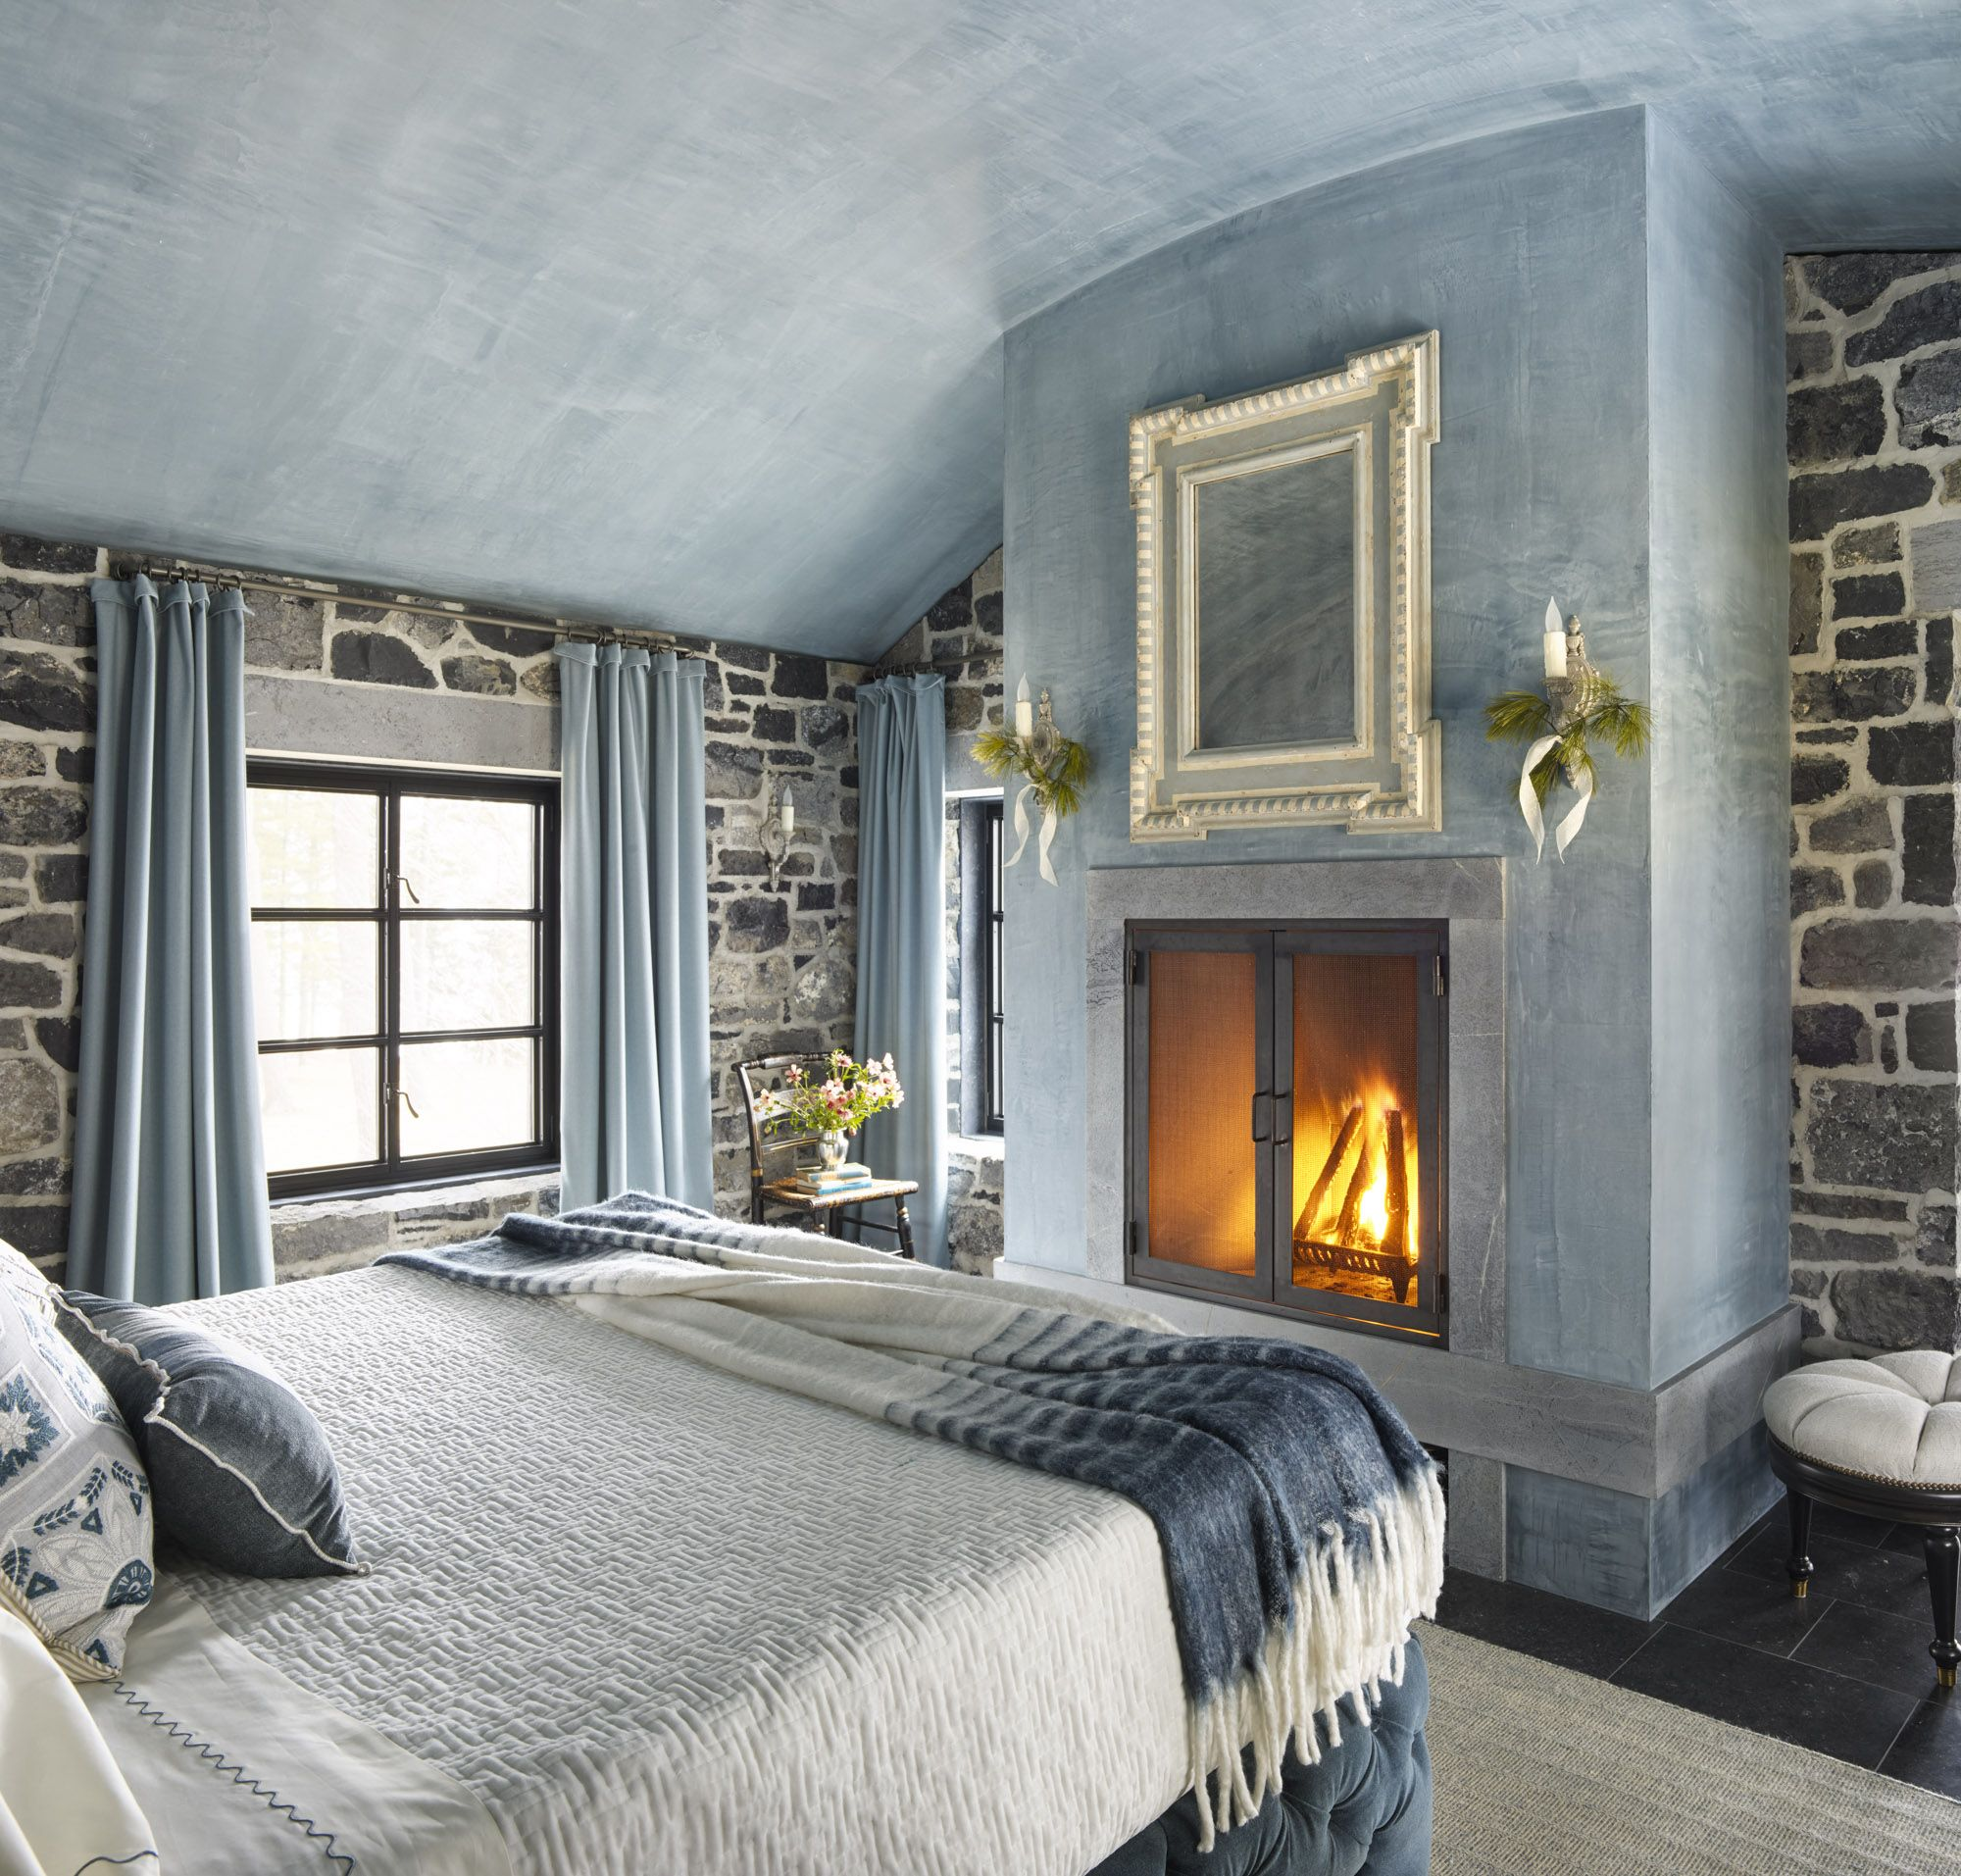 50 stylish bedroom design ideas modern bedrooms decorating tips rh housebeautiful com  bedroom design inspiration minimal